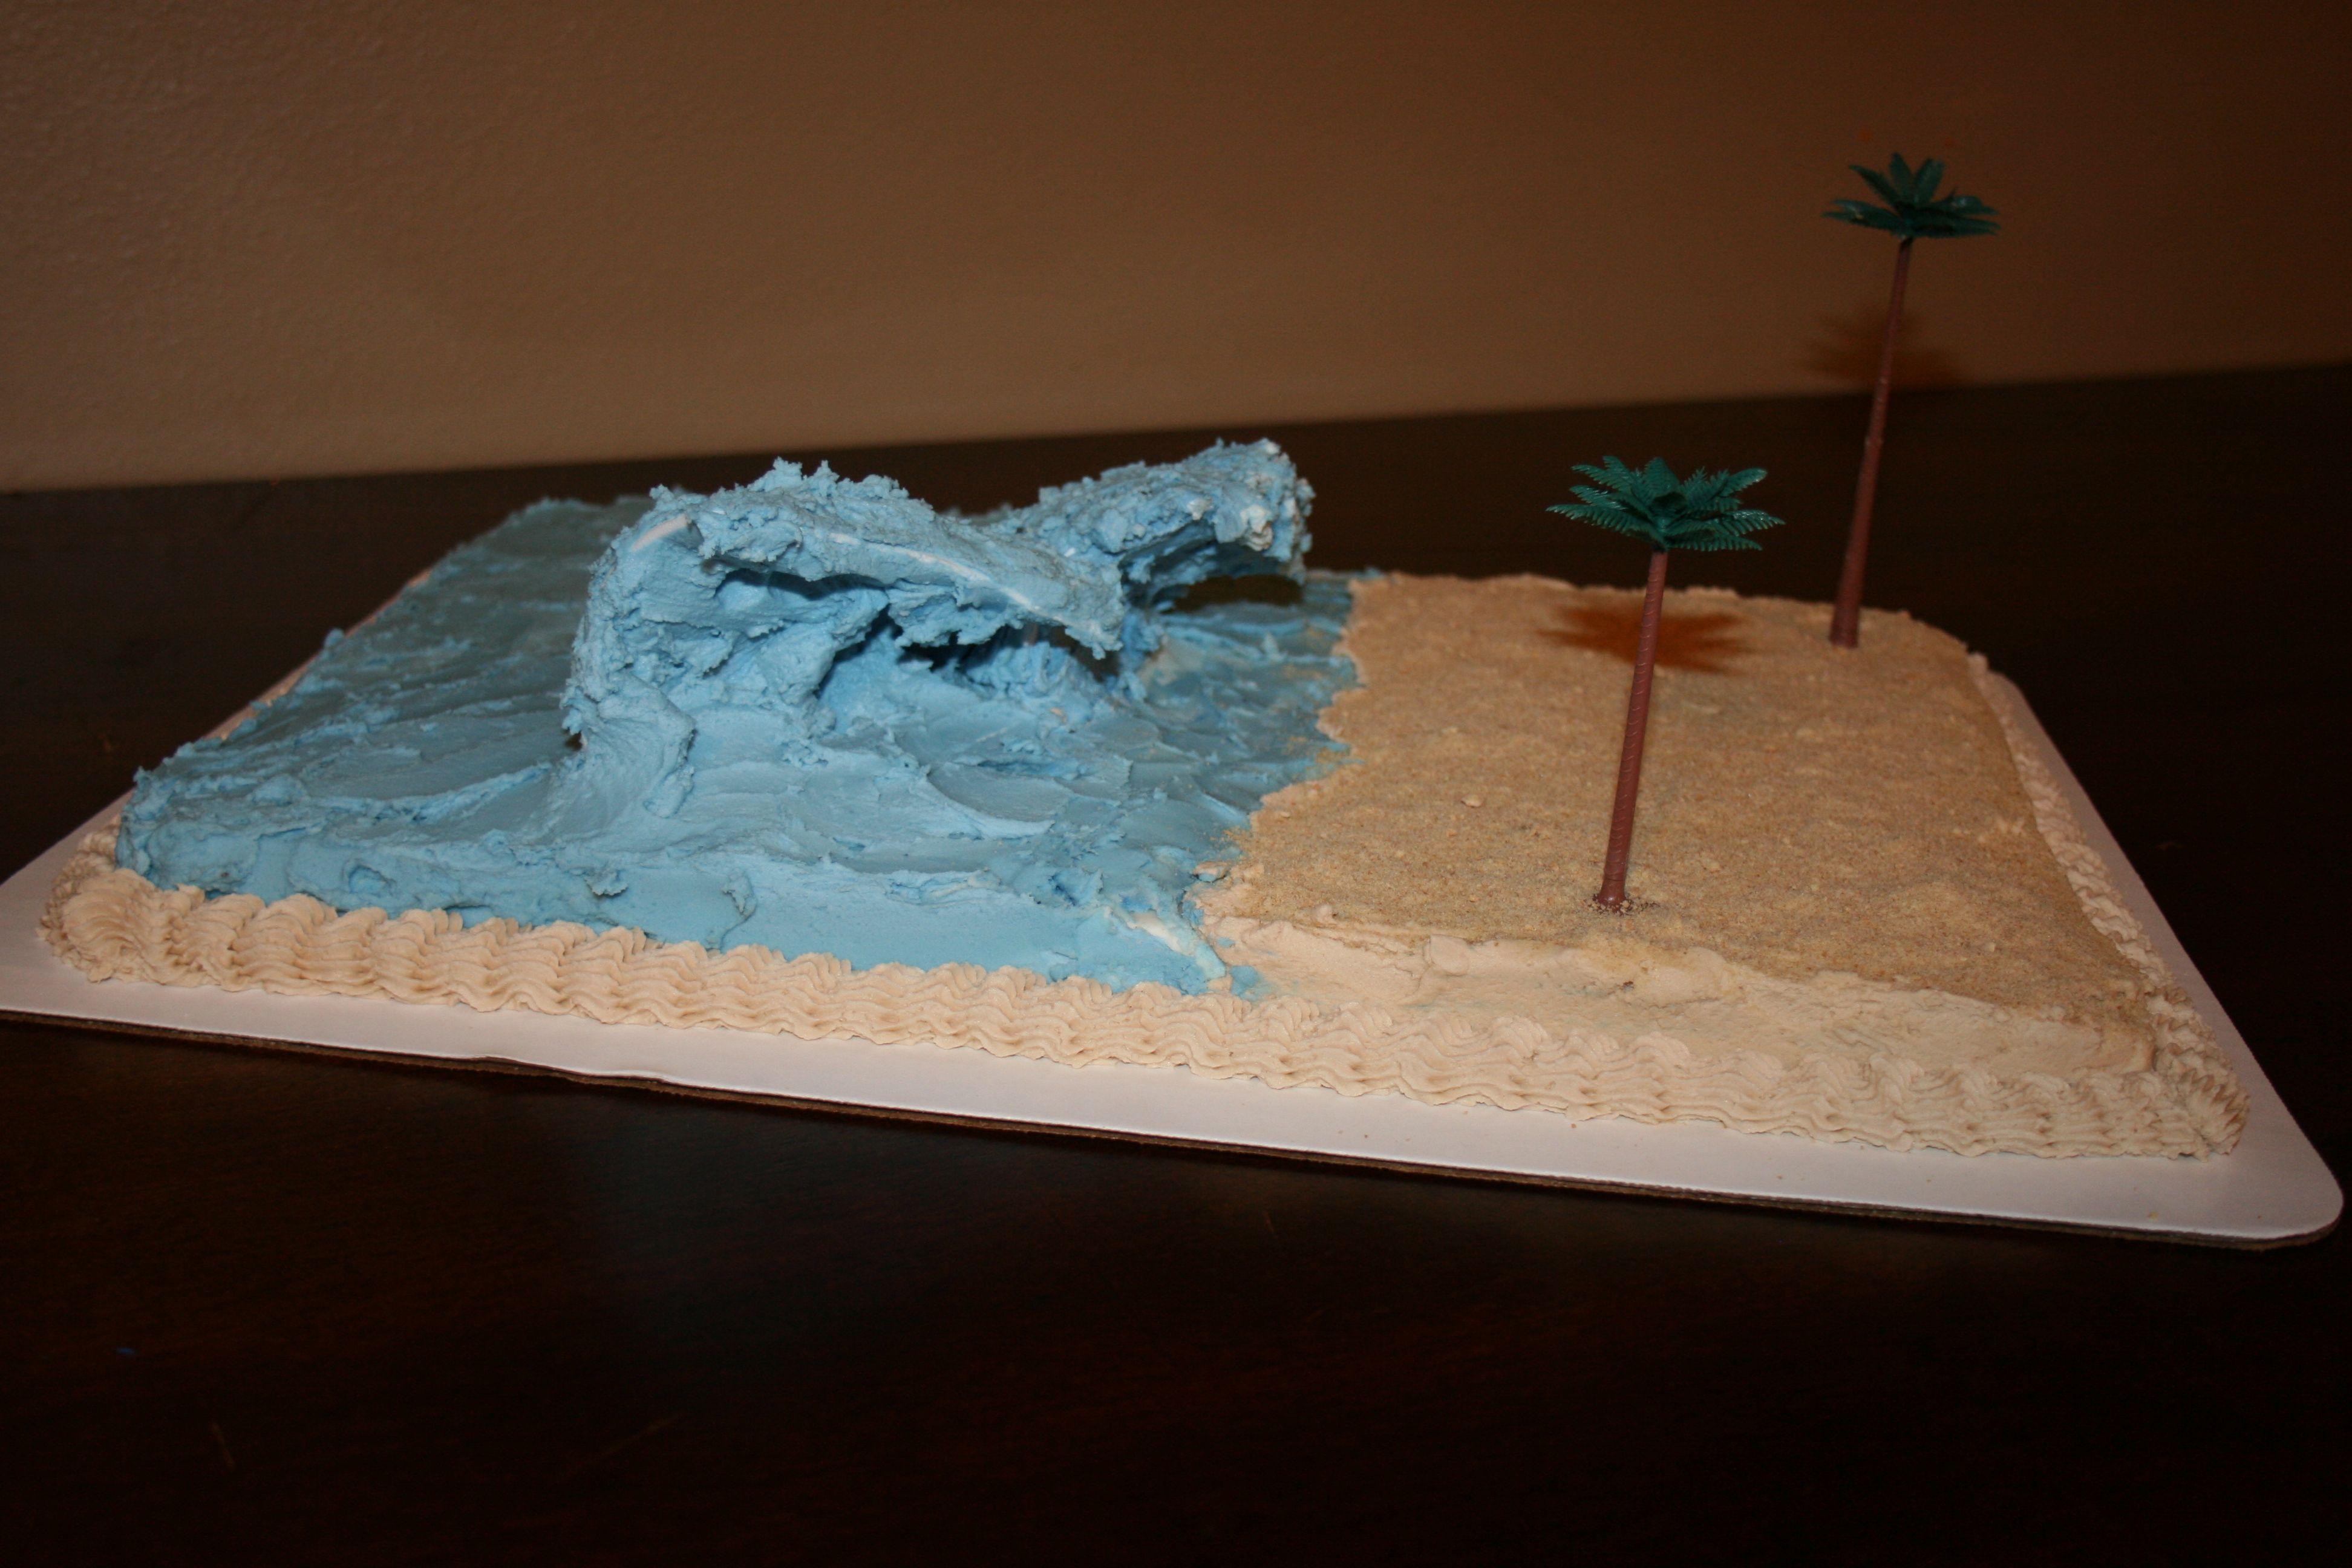 Tsunami Science Project Cake Natural Disaster Big Wave